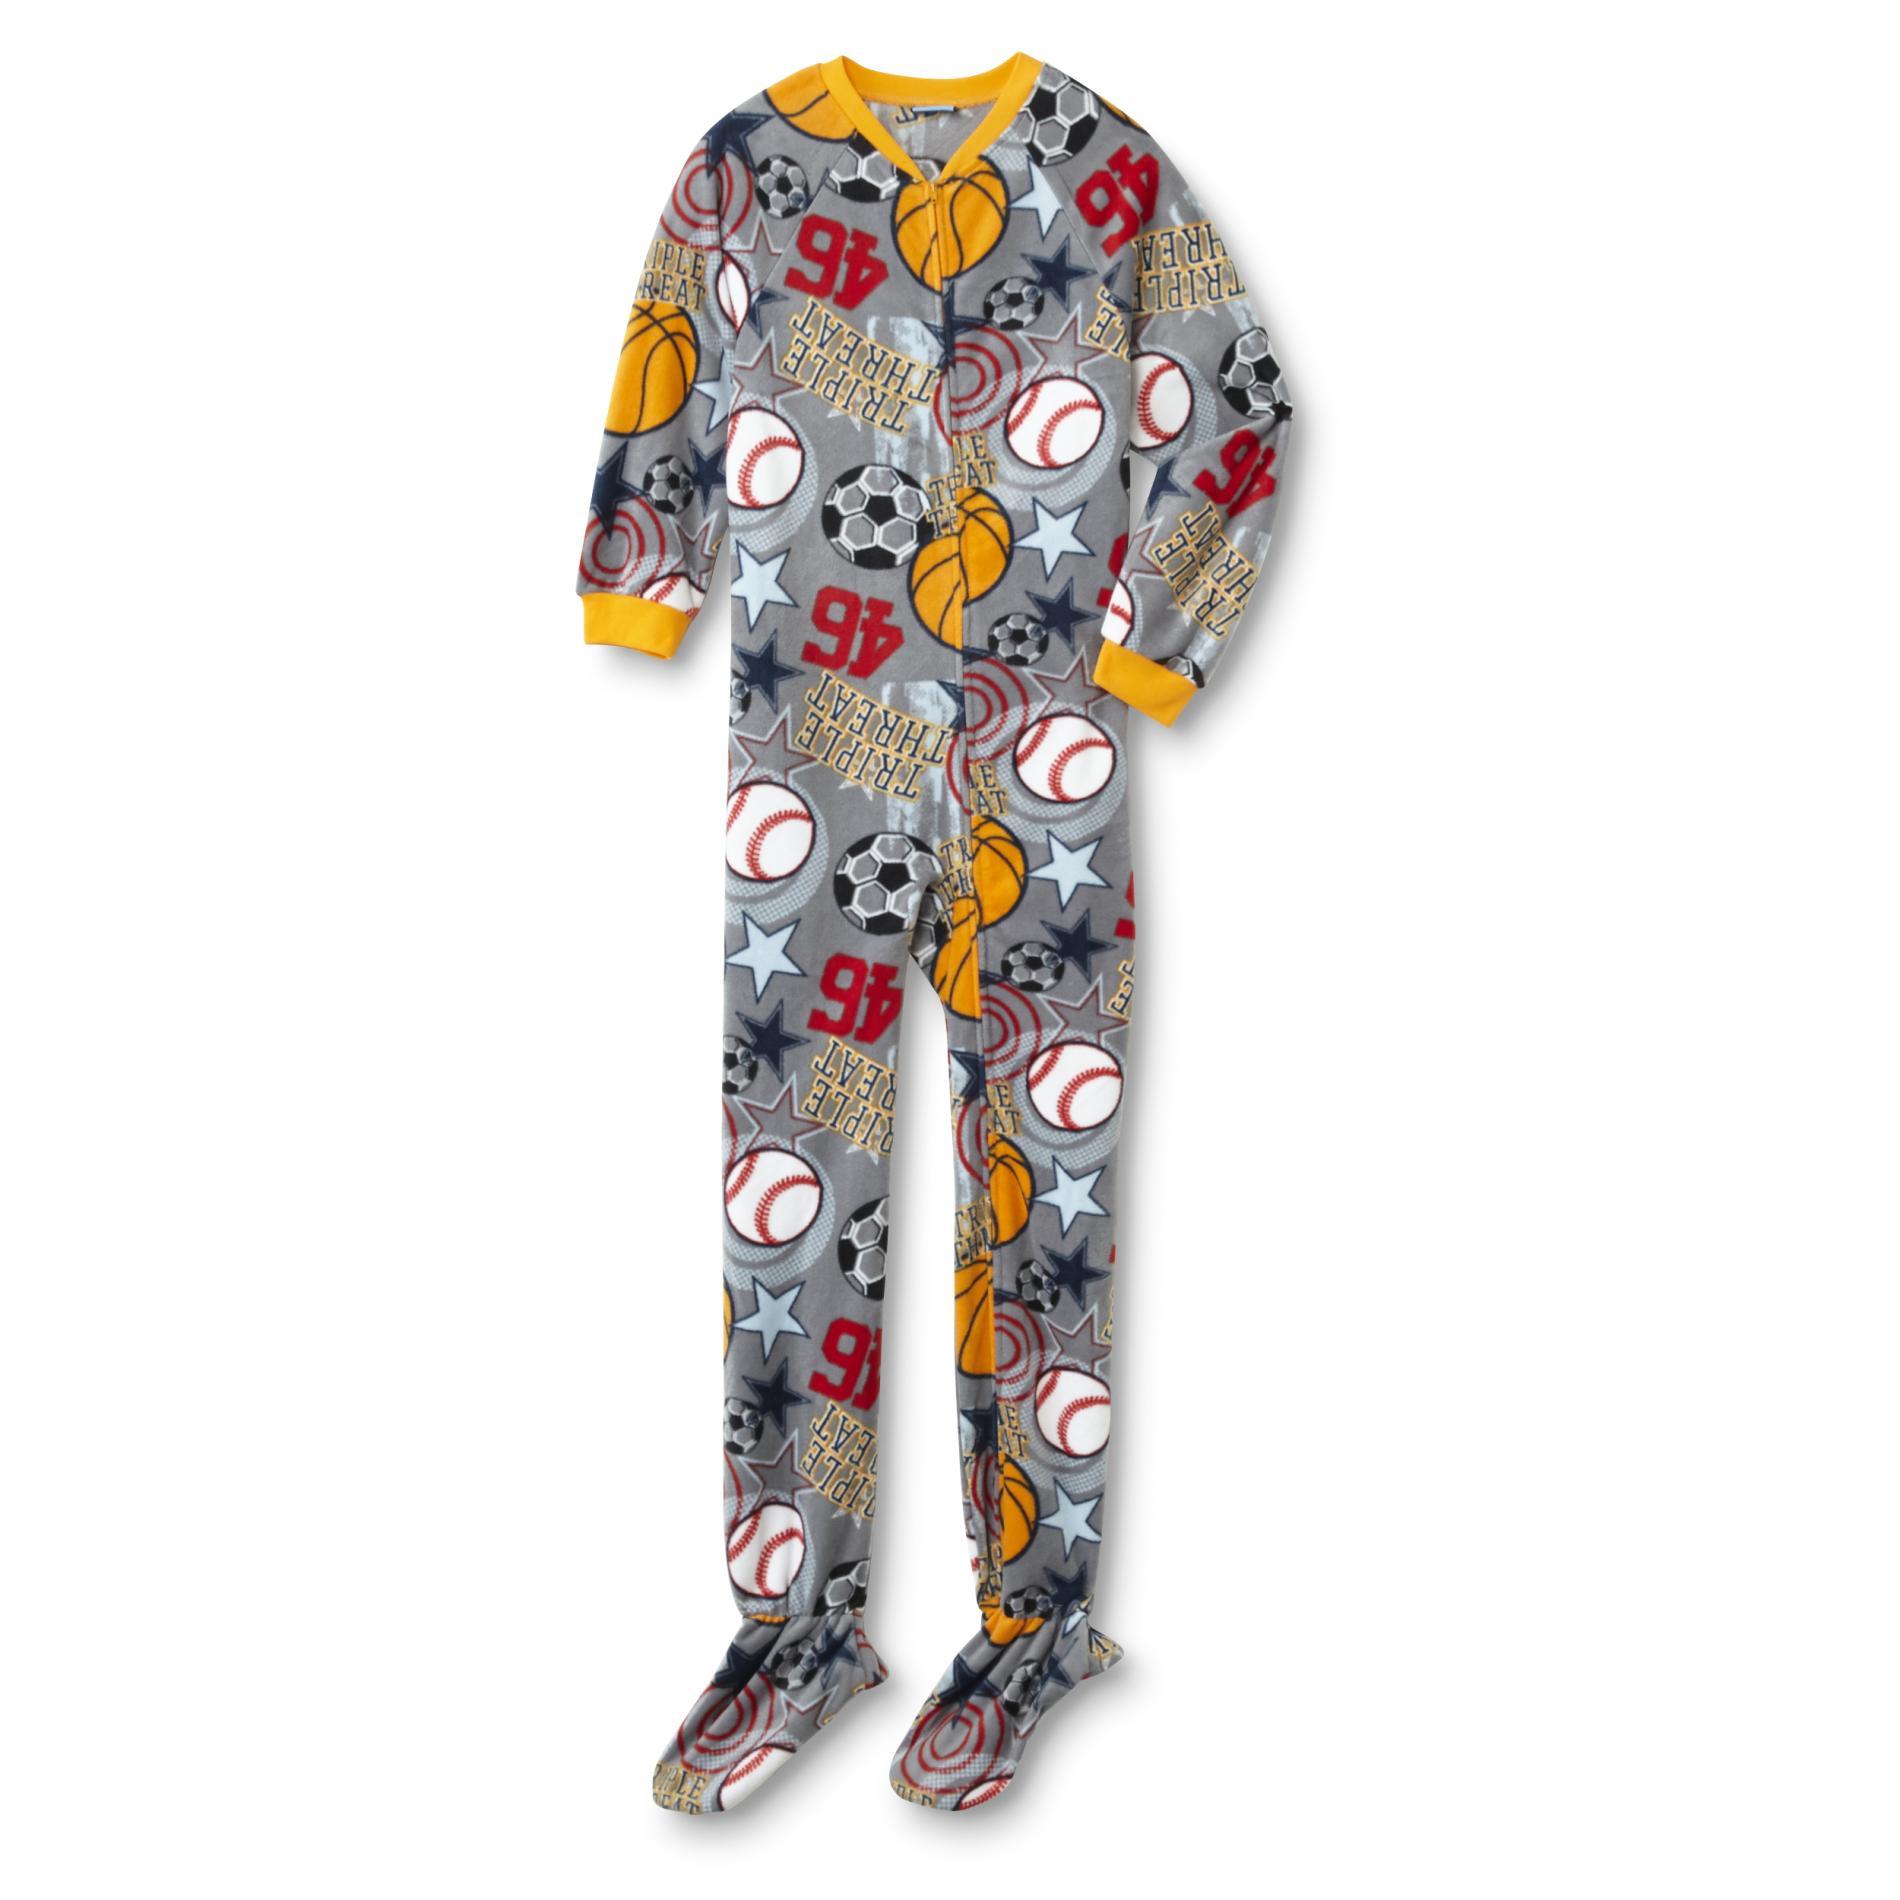 Joe Boxer Boys' Fleece Footed Pajamas - Sports